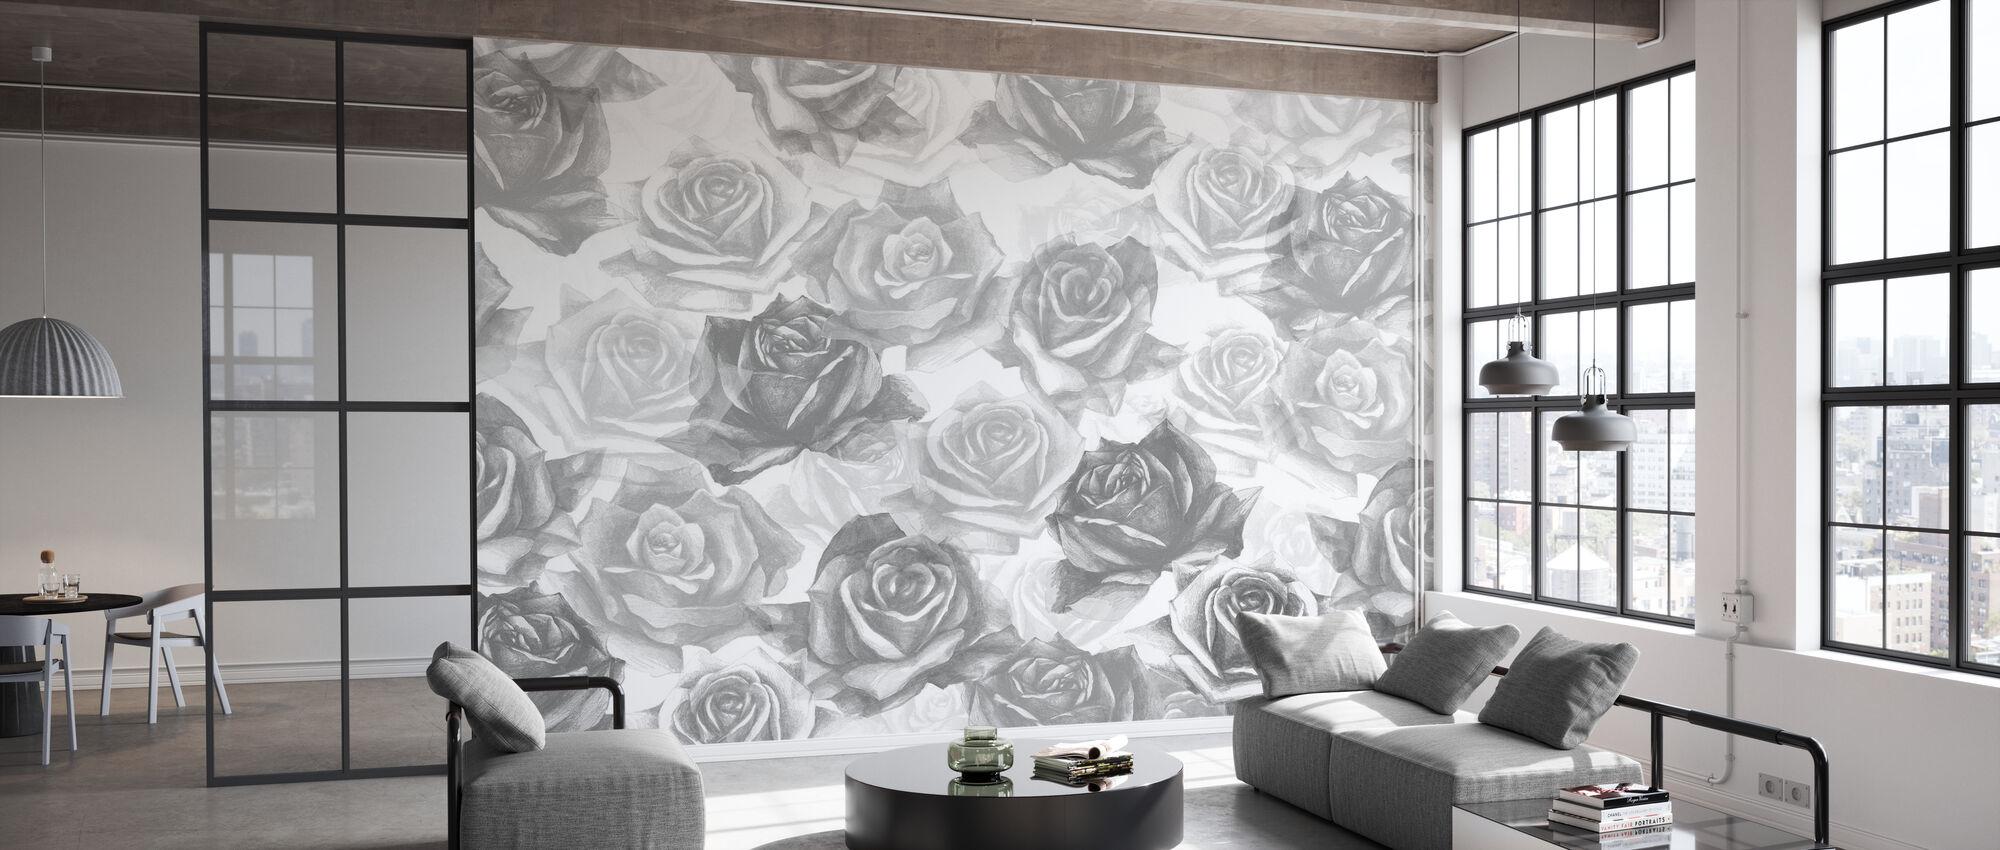 My Grey Roses - Wallpaper - Office